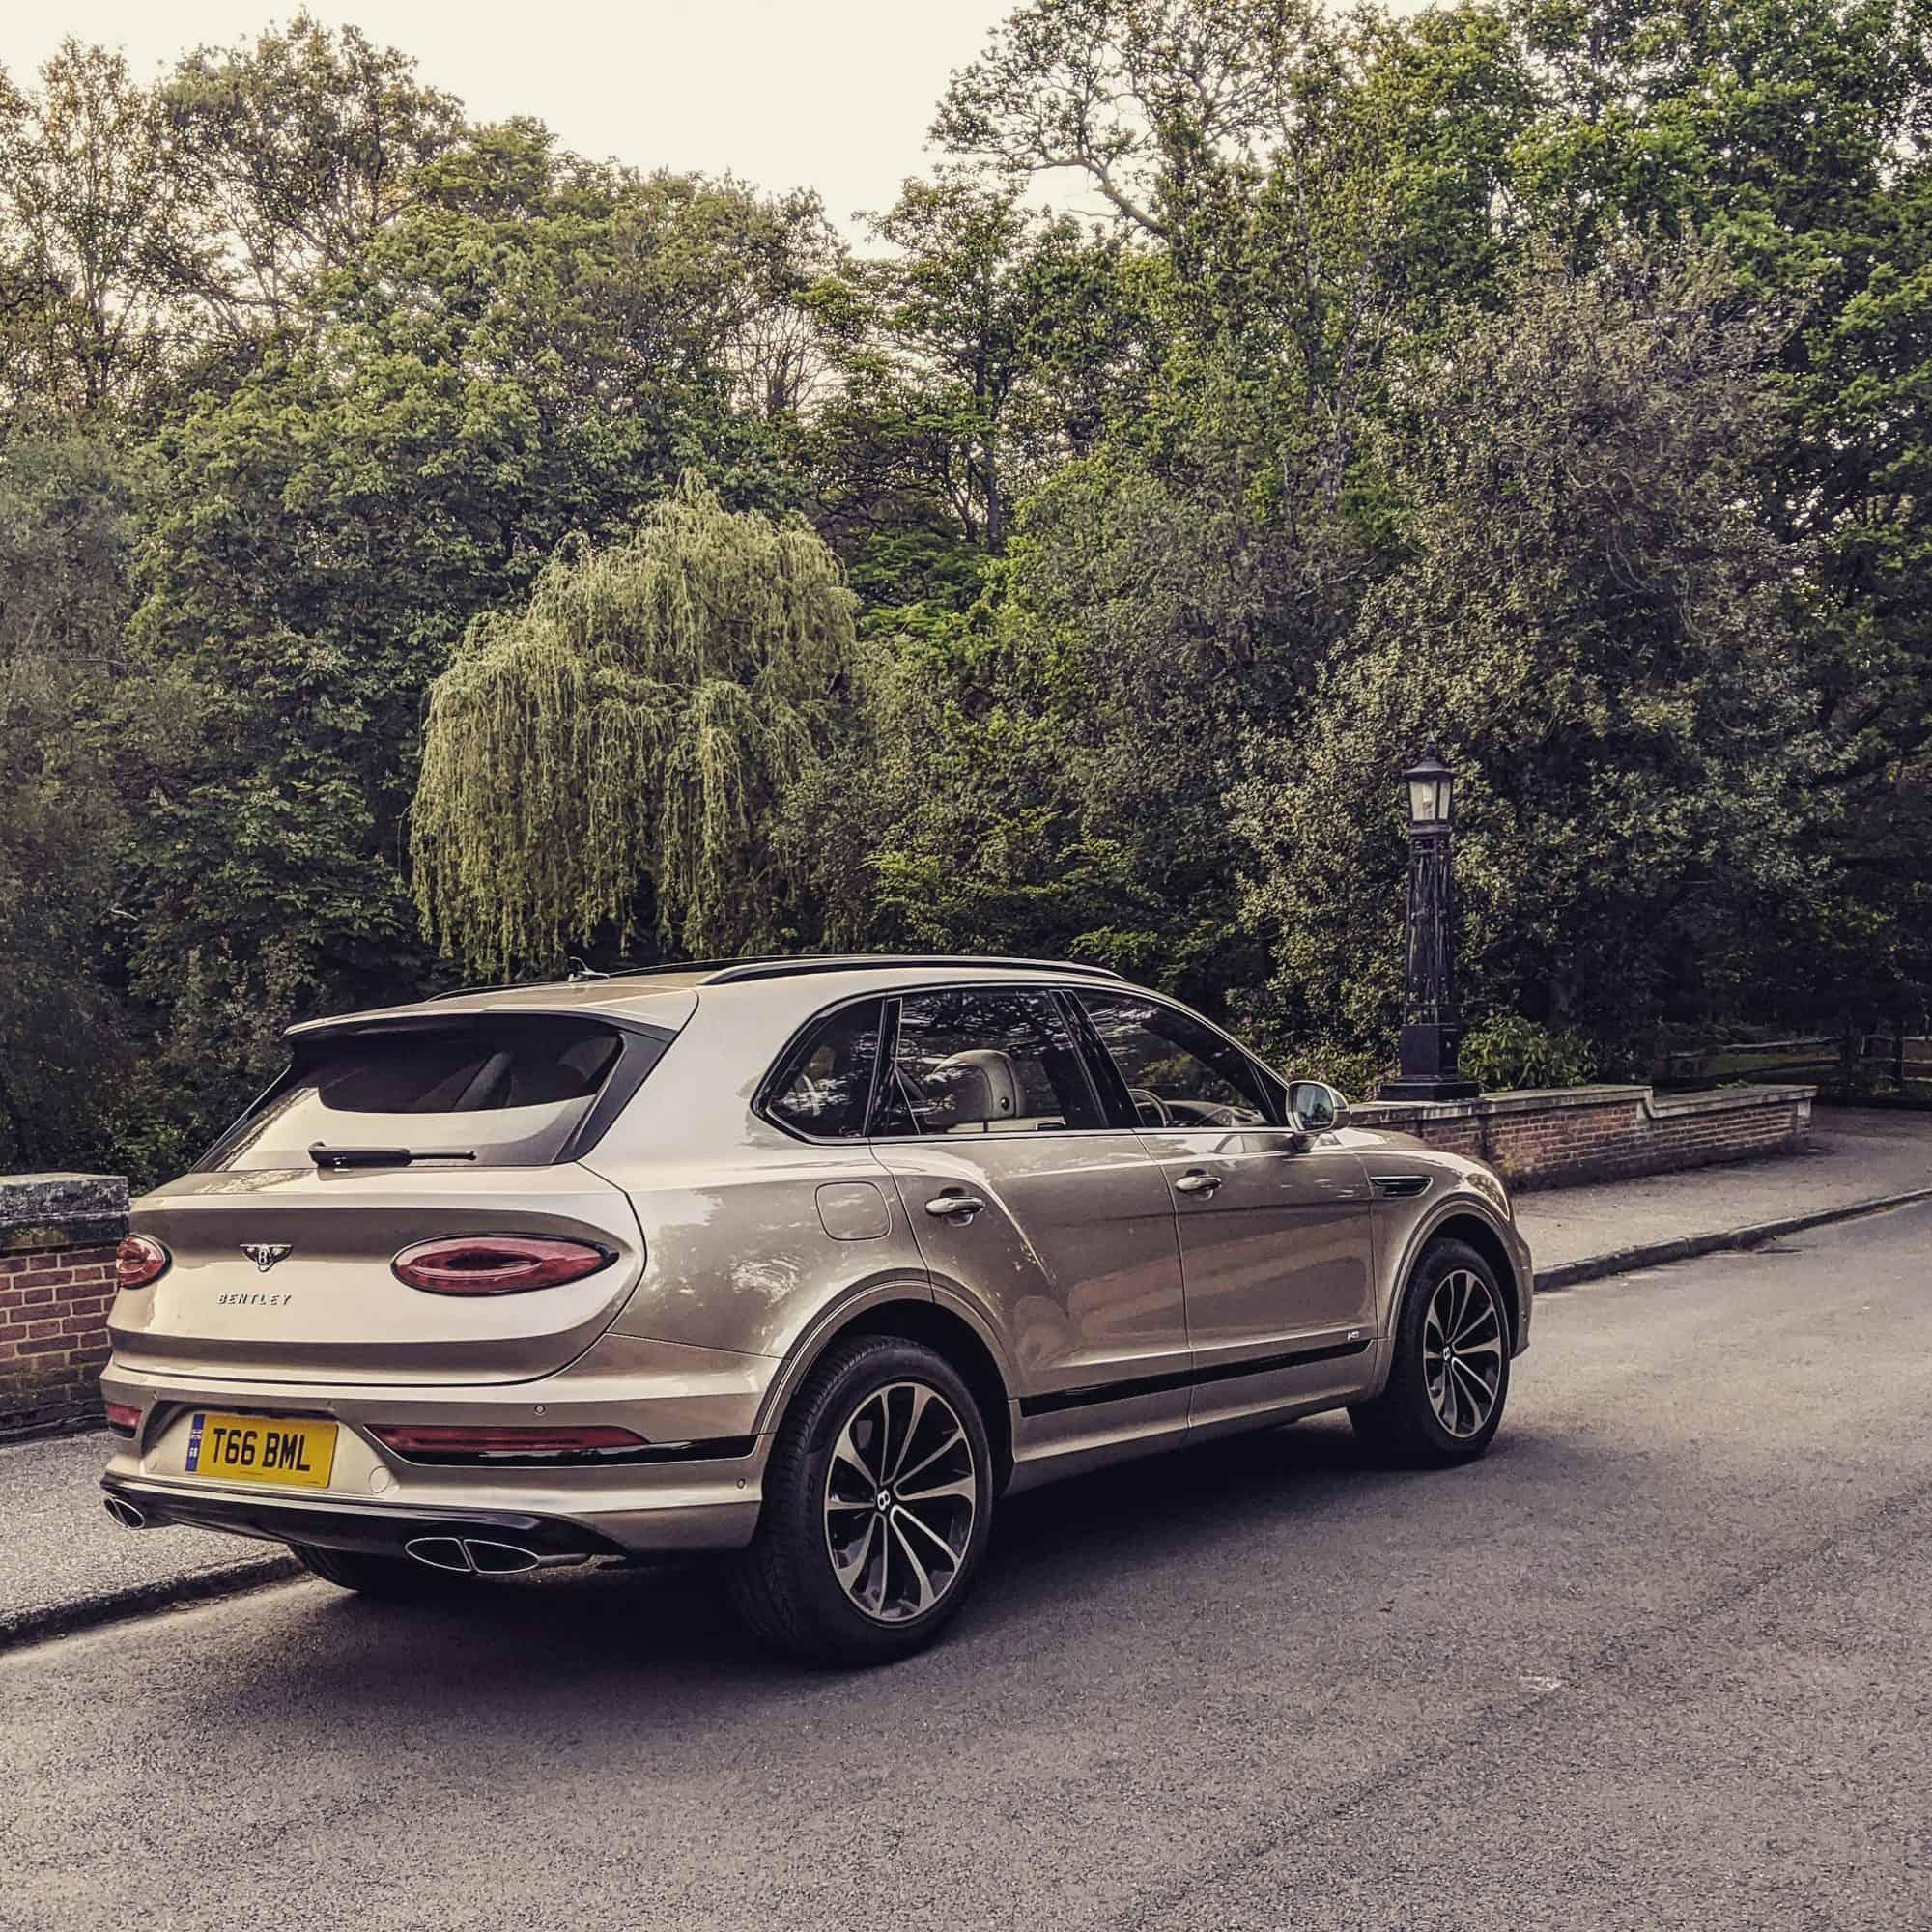 TLE drives: The Bentley Bentayga